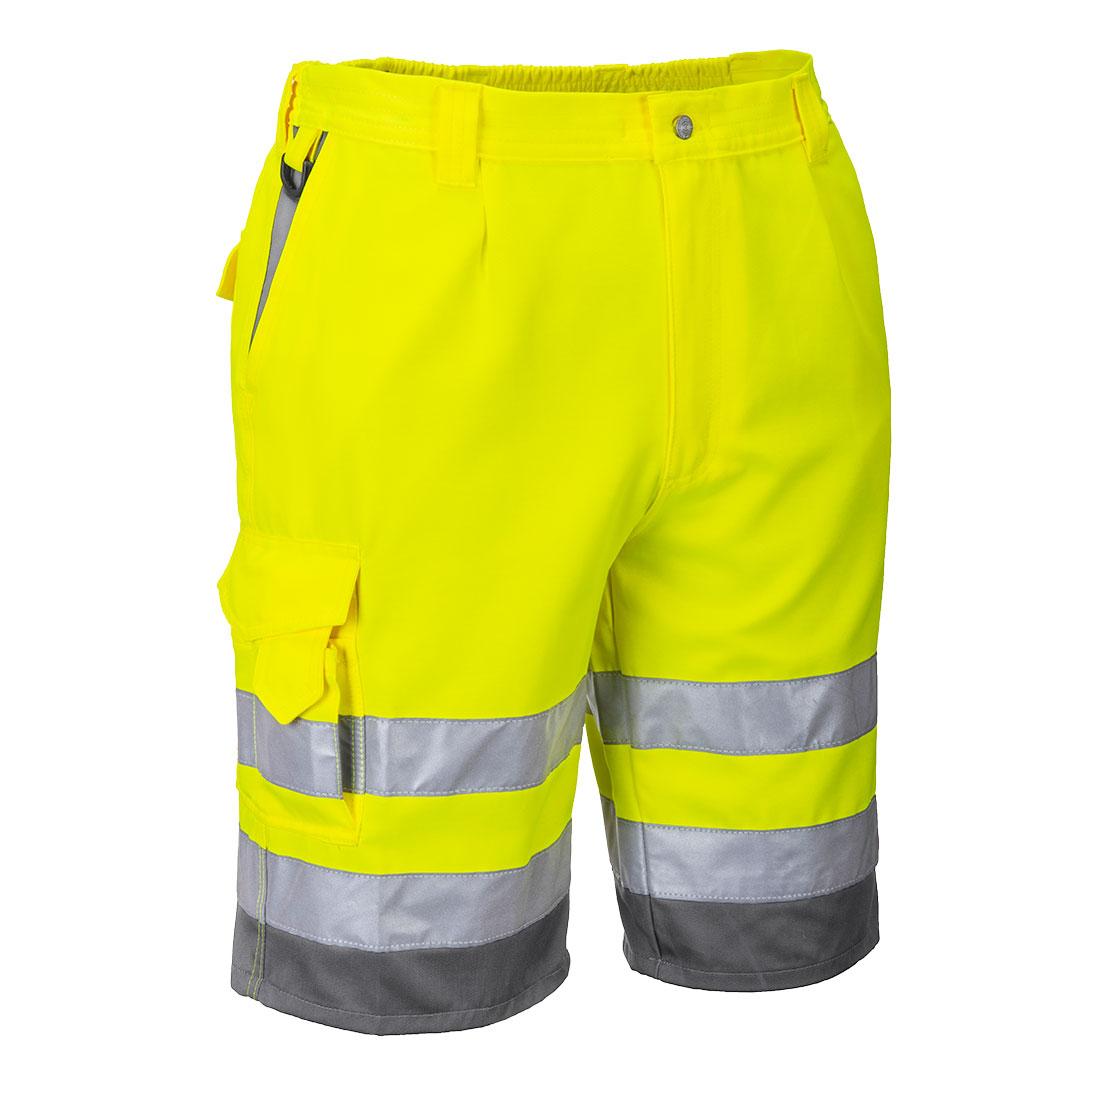 Hi-Vis P/C Shorts Yellow/Grey S